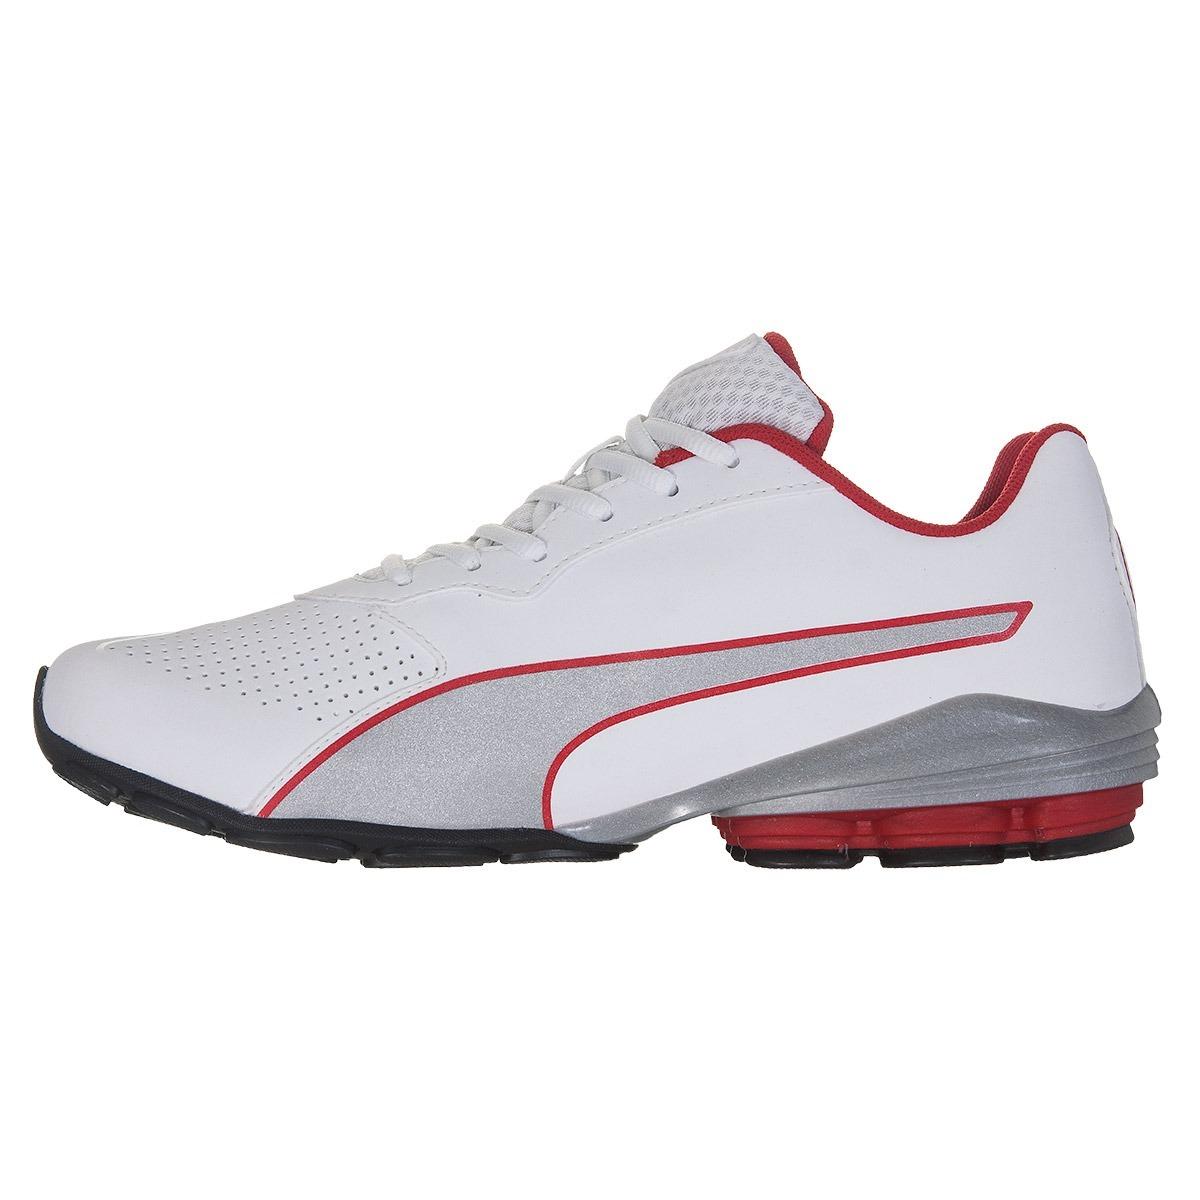 Carregando zoom... tênis puma flume sl masculino - branco vermelho 5b37fbb352f84